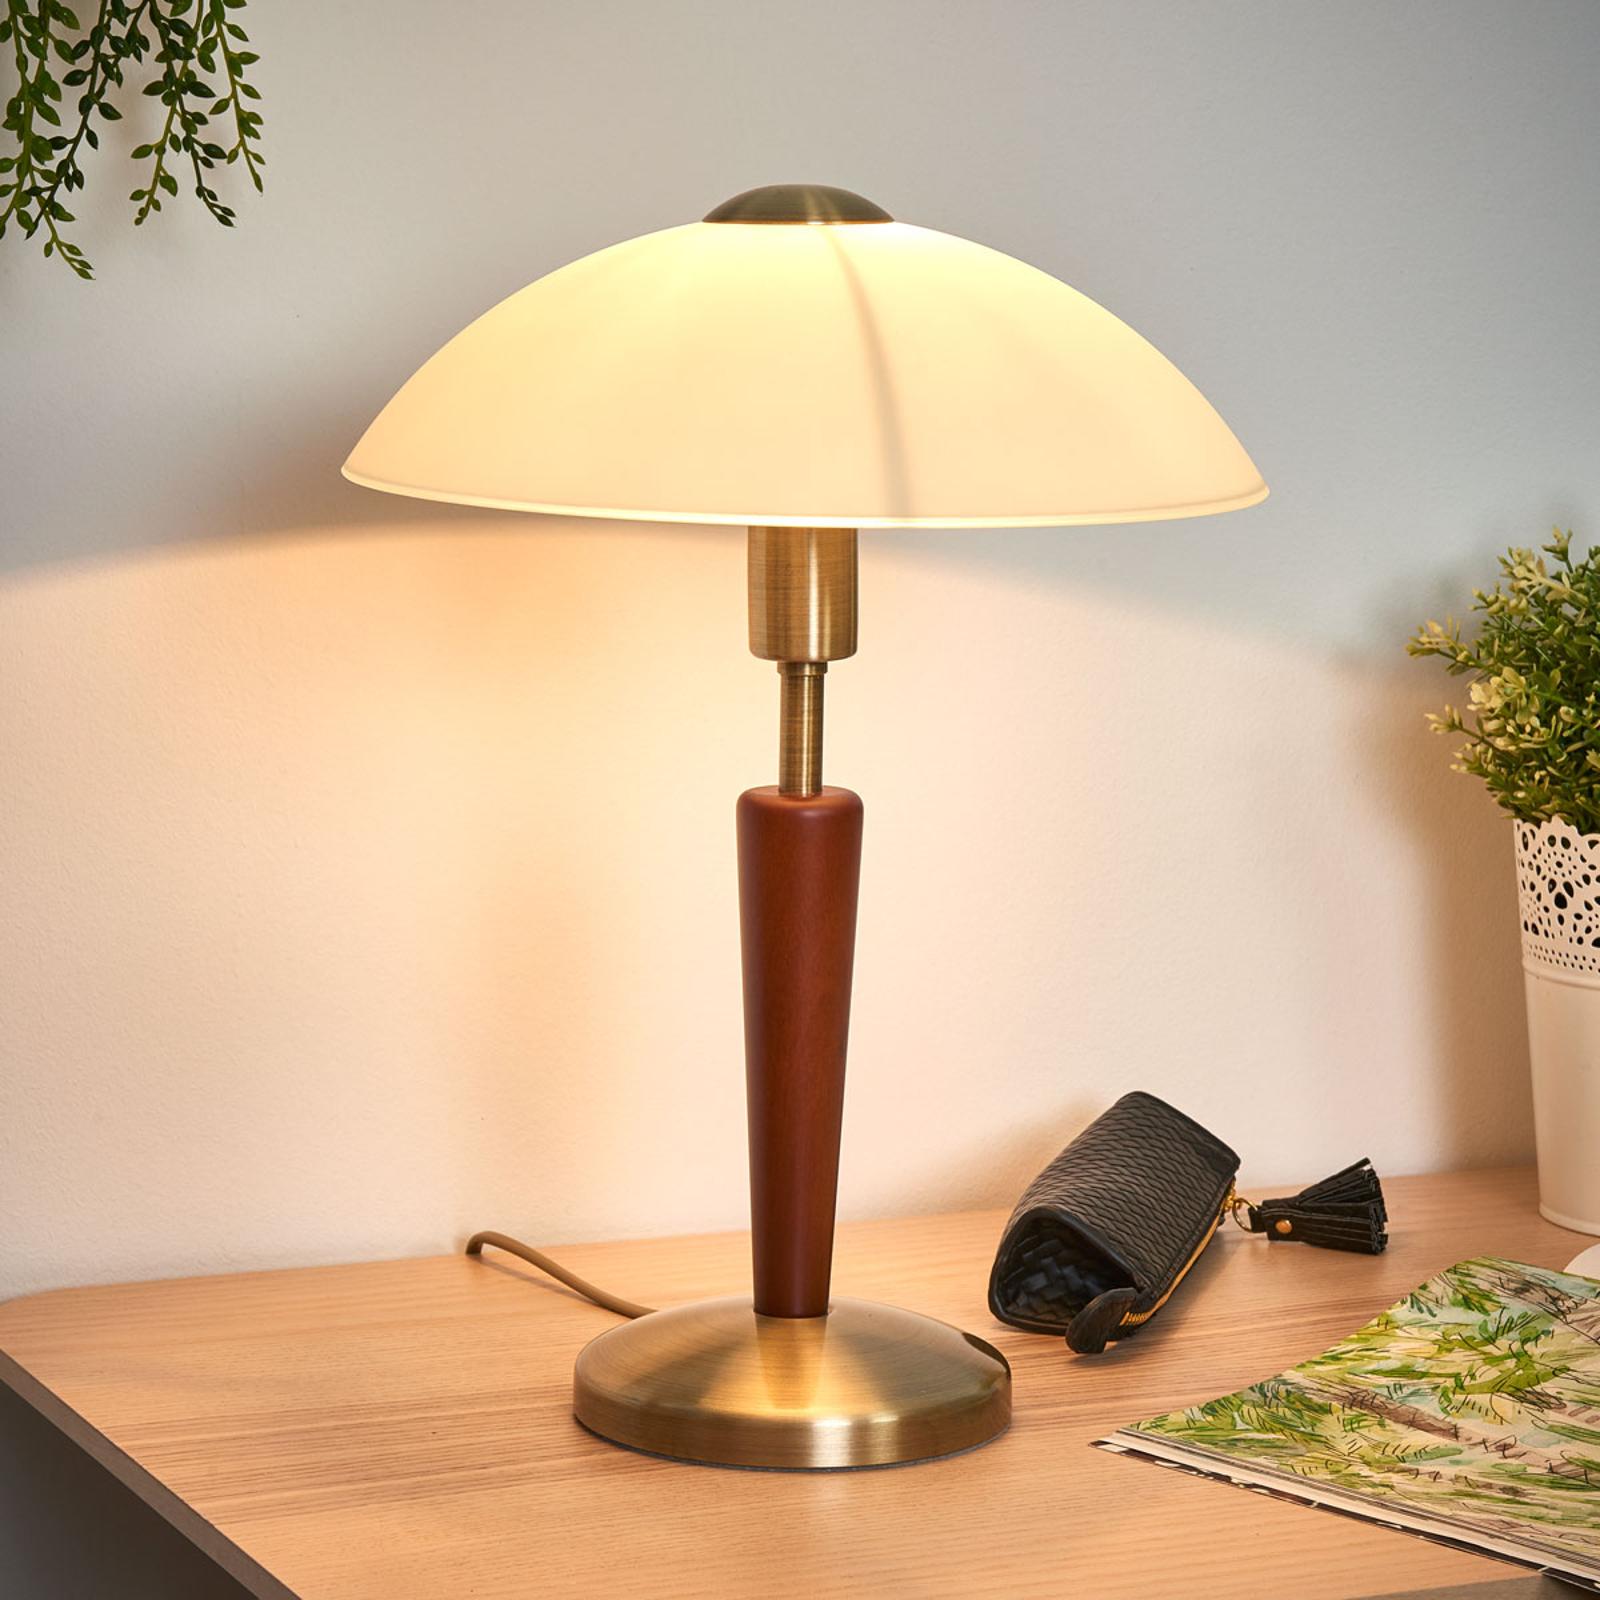 Wood-metal mix table lamp Salut, burnished, nut_3001577_1